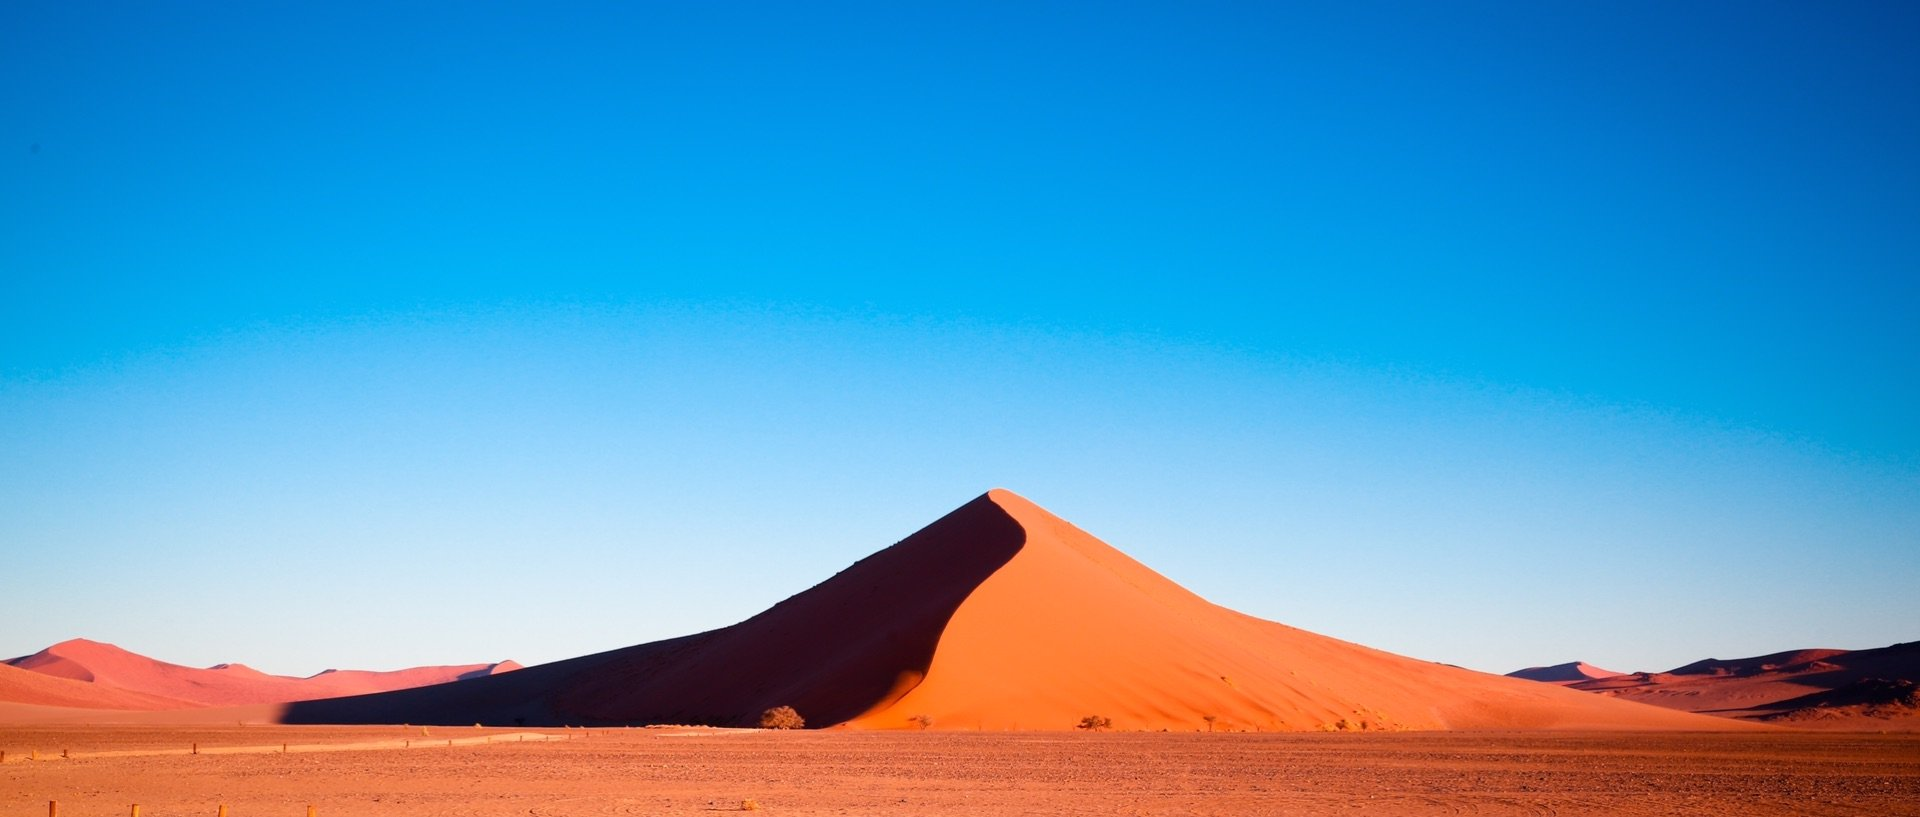 Swing in 非洲!纳米比亚20天,狂野与温暖并存的美好国度。